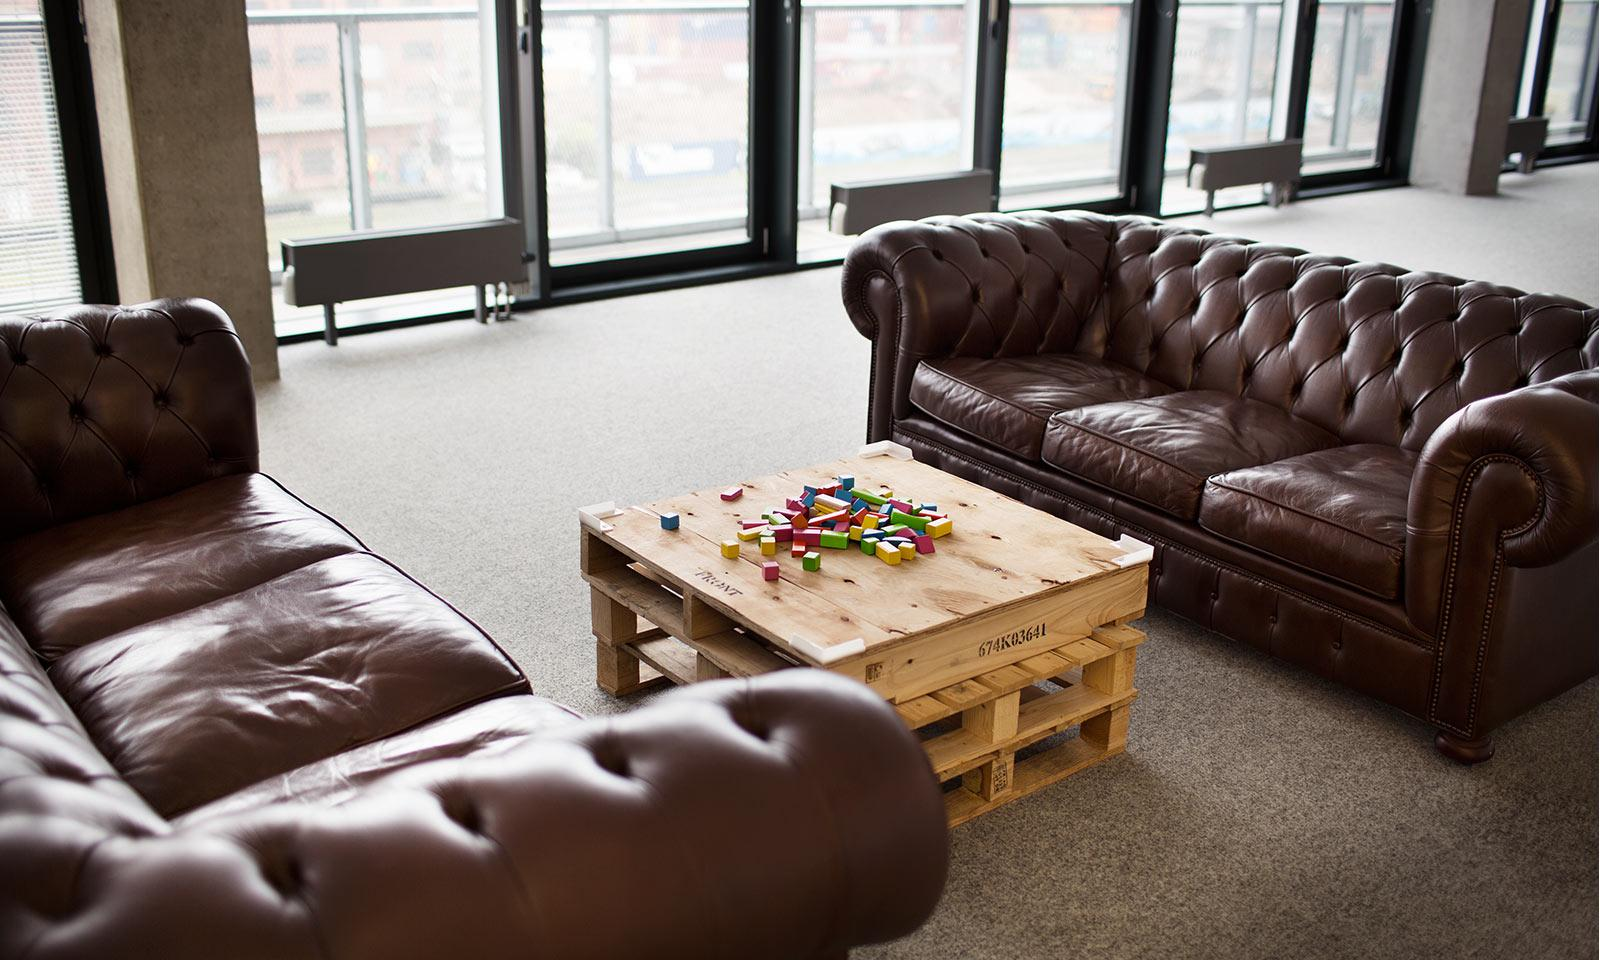 kontakt shift digital agentur hamburg frankfurt. Black Bedroom Furniture Sets. Home Design Ideas